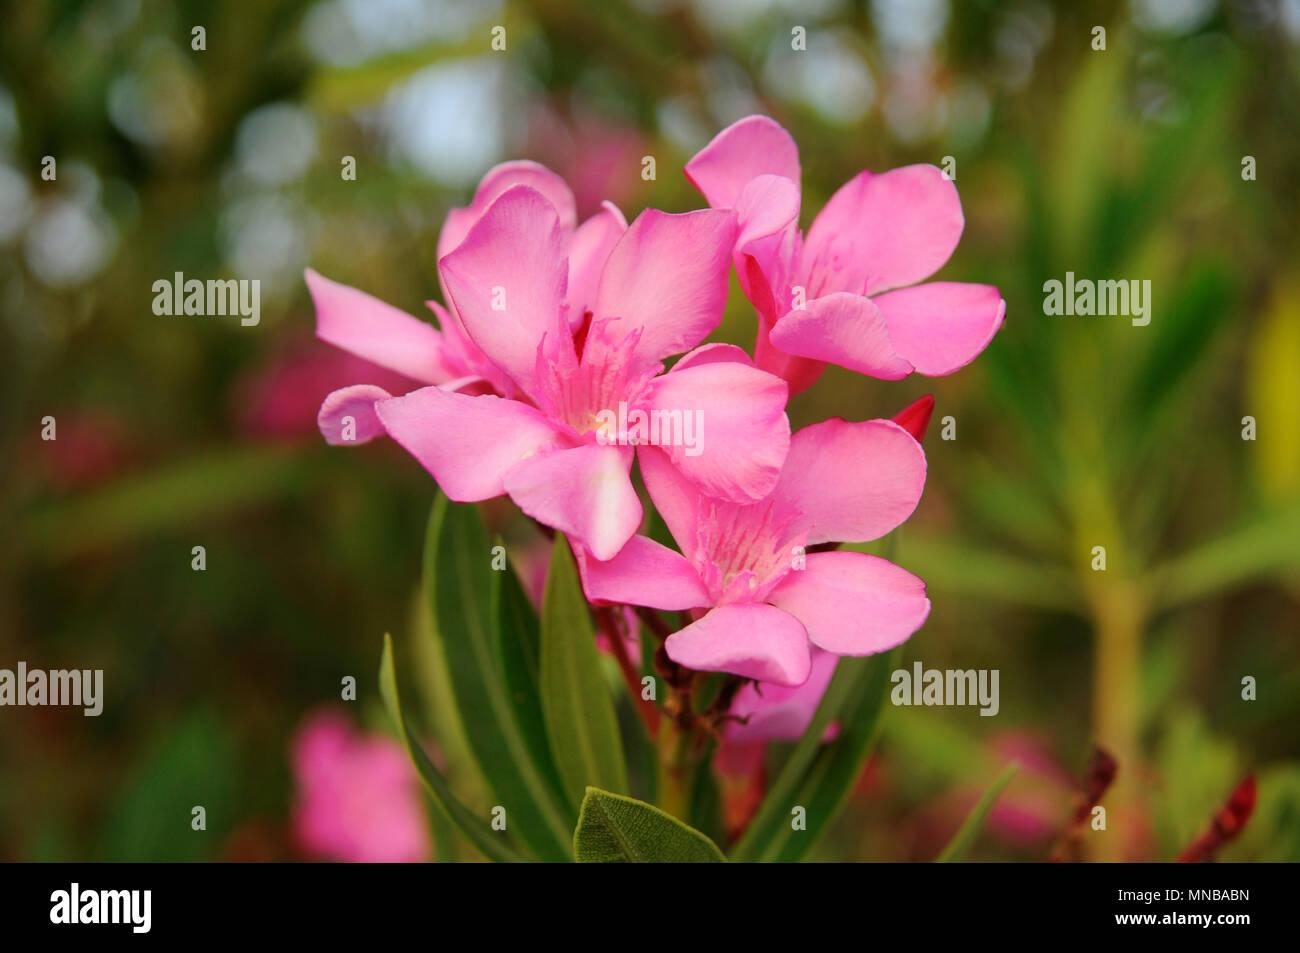 pink flower s branch oleander nerium stock photo 185261097 alamy